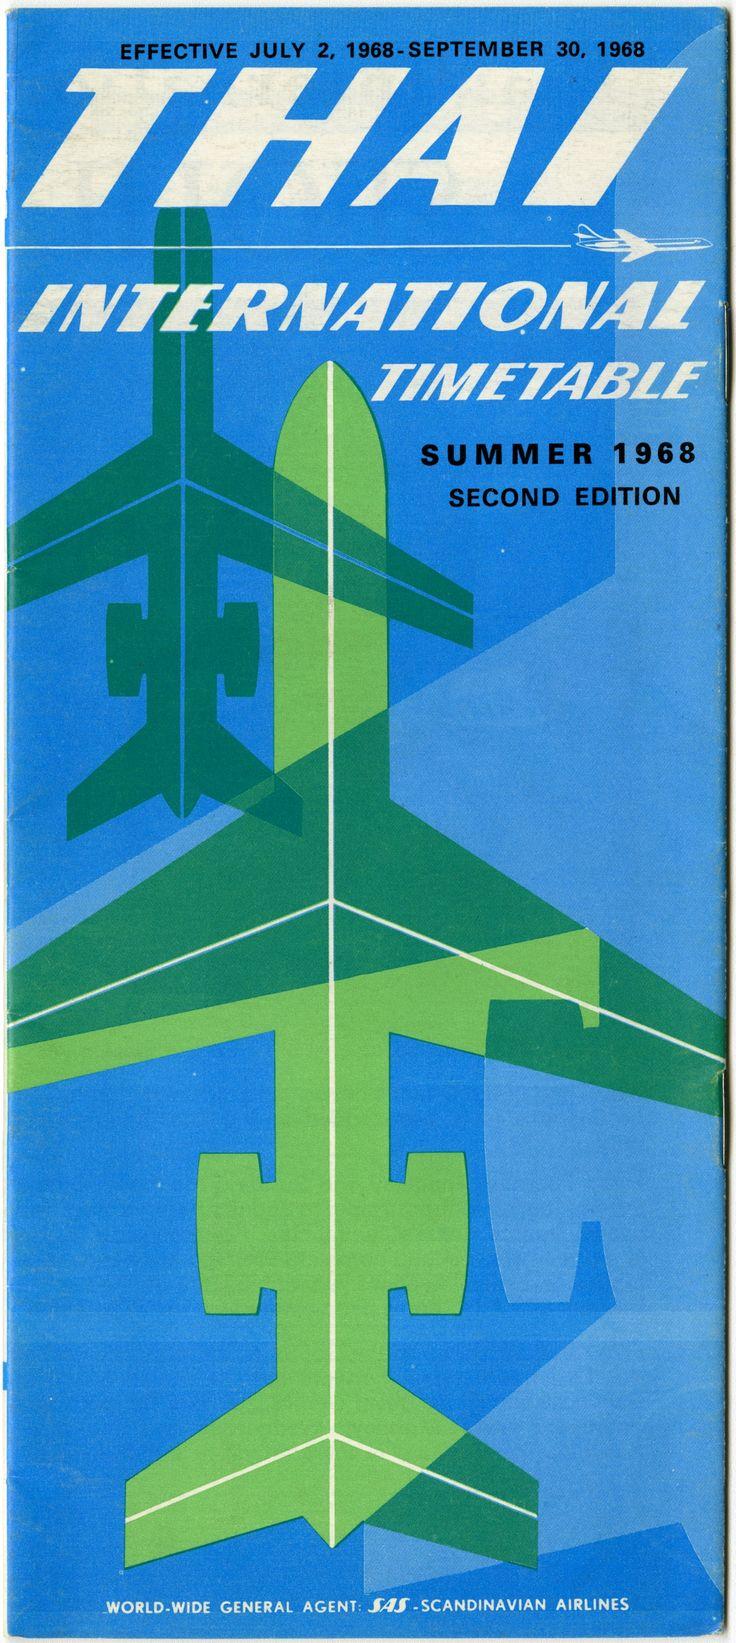 timetable: Thai Airways International | Summer timetable issued by Thai Airways International, effective July 2 through September 30, 1968 | http://www.flysfo.com/museum/